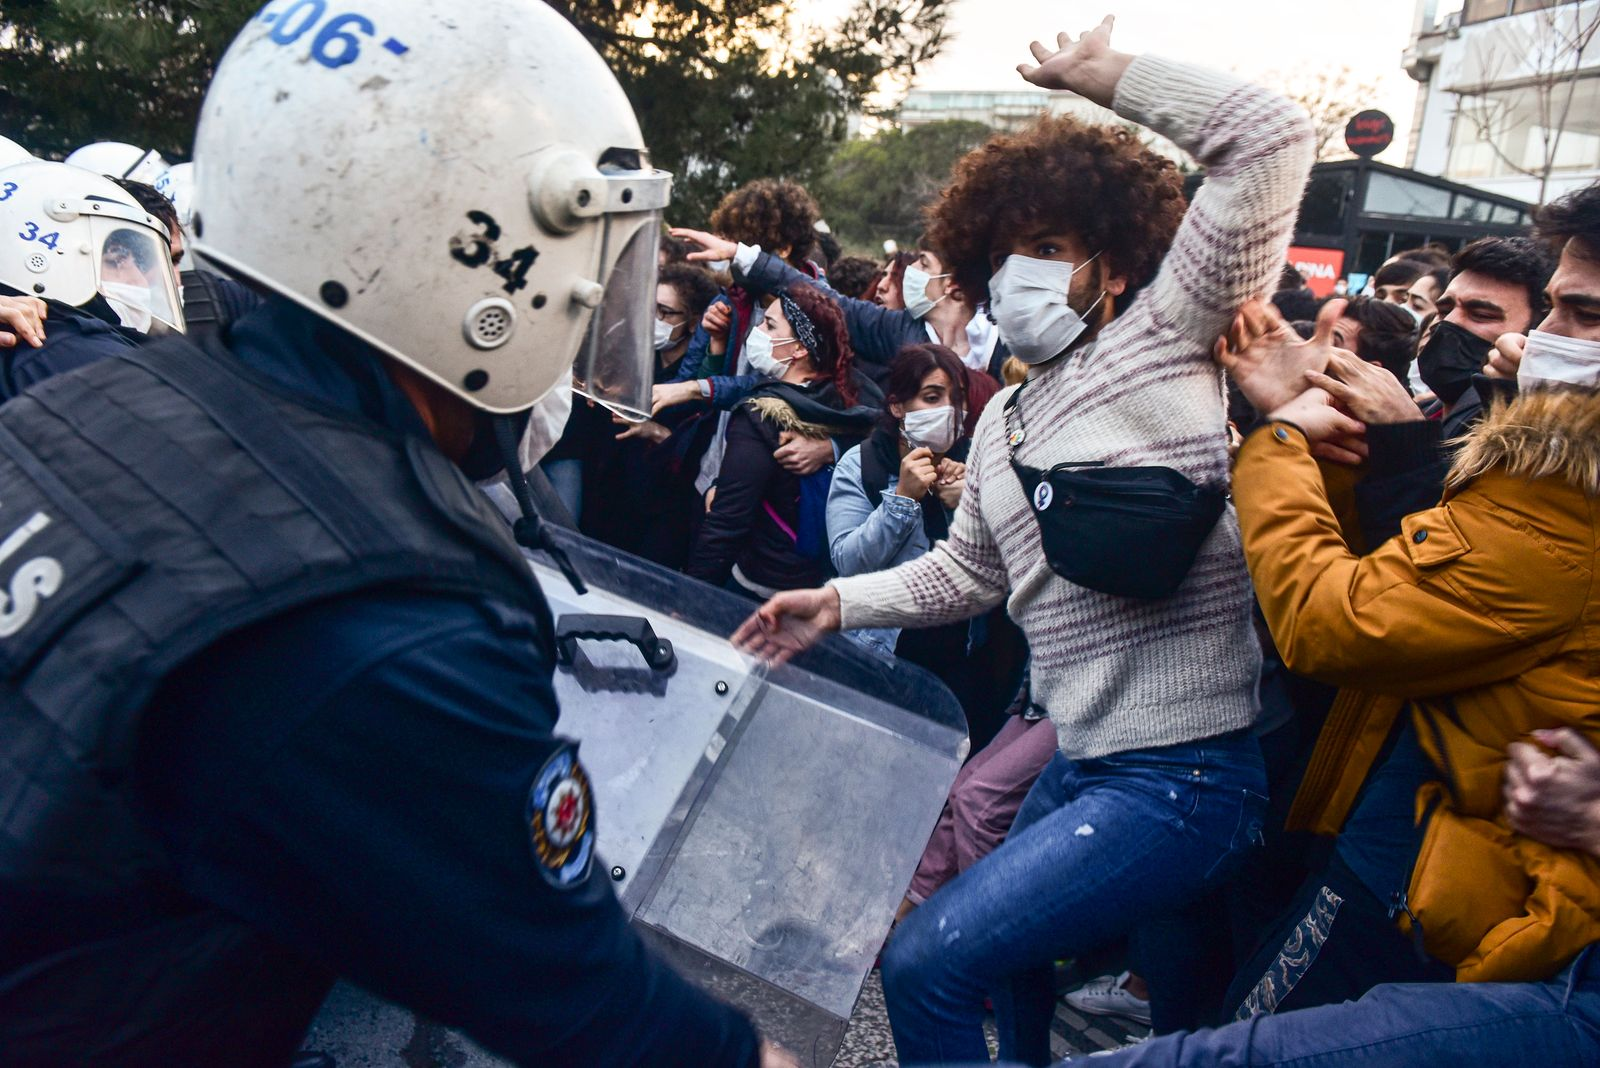 Bogazici / Studentenproteste